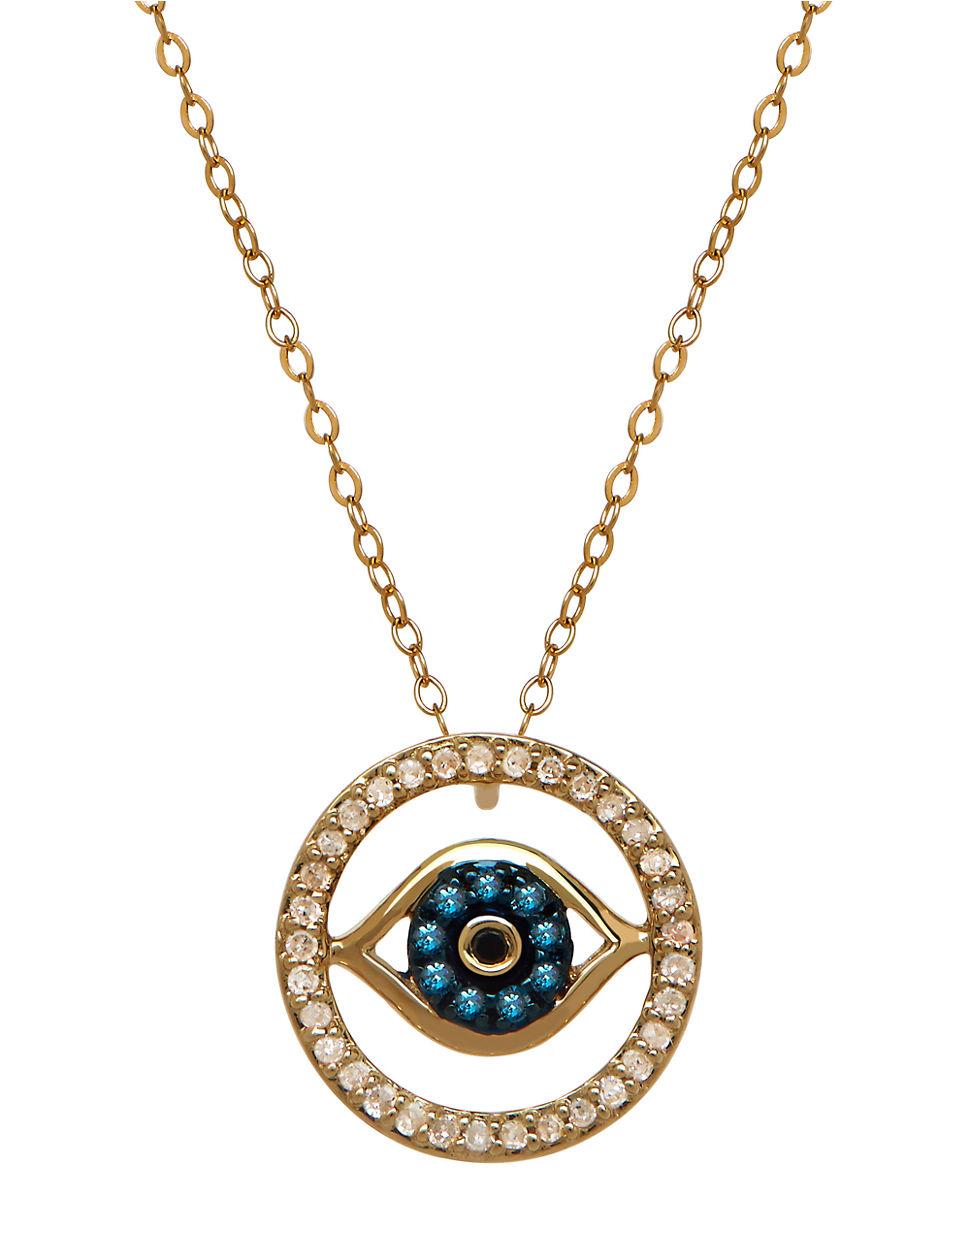 lord taylor 14k gold diamond evil eye necklace in. Black Bedroom Furniture Sets. Home Design Ideas